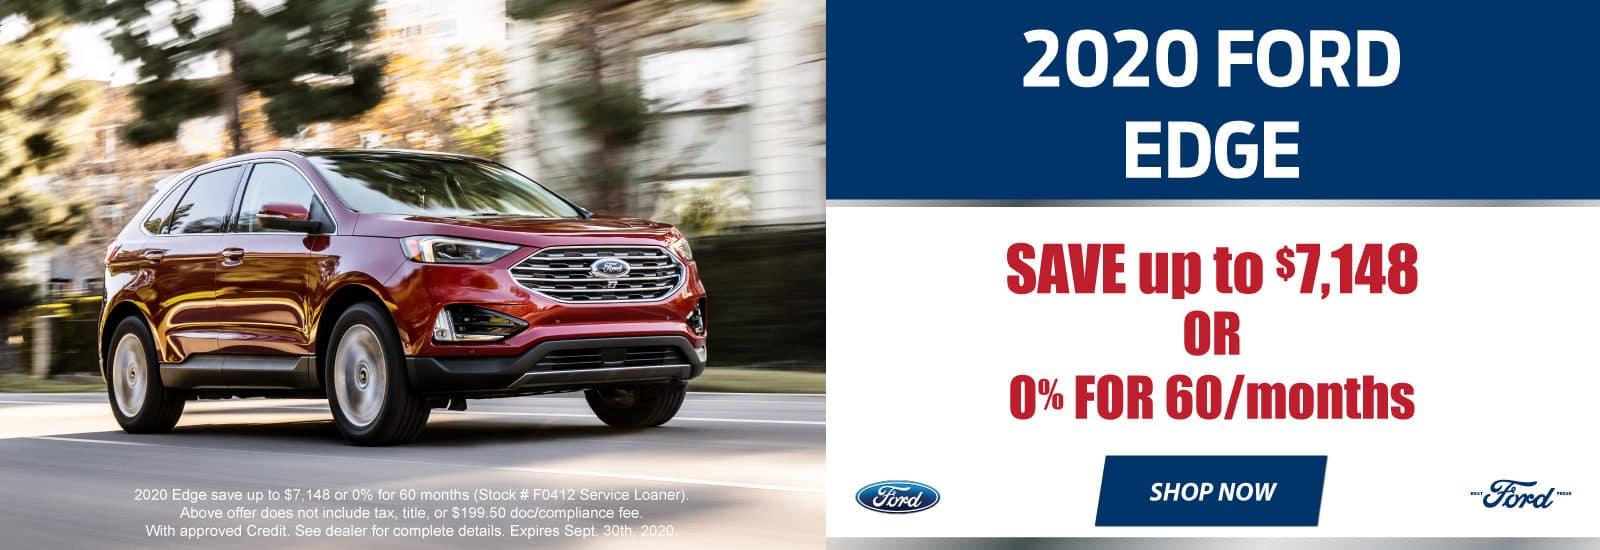 2020-Ford-Edge-Web-Banner-1600×550